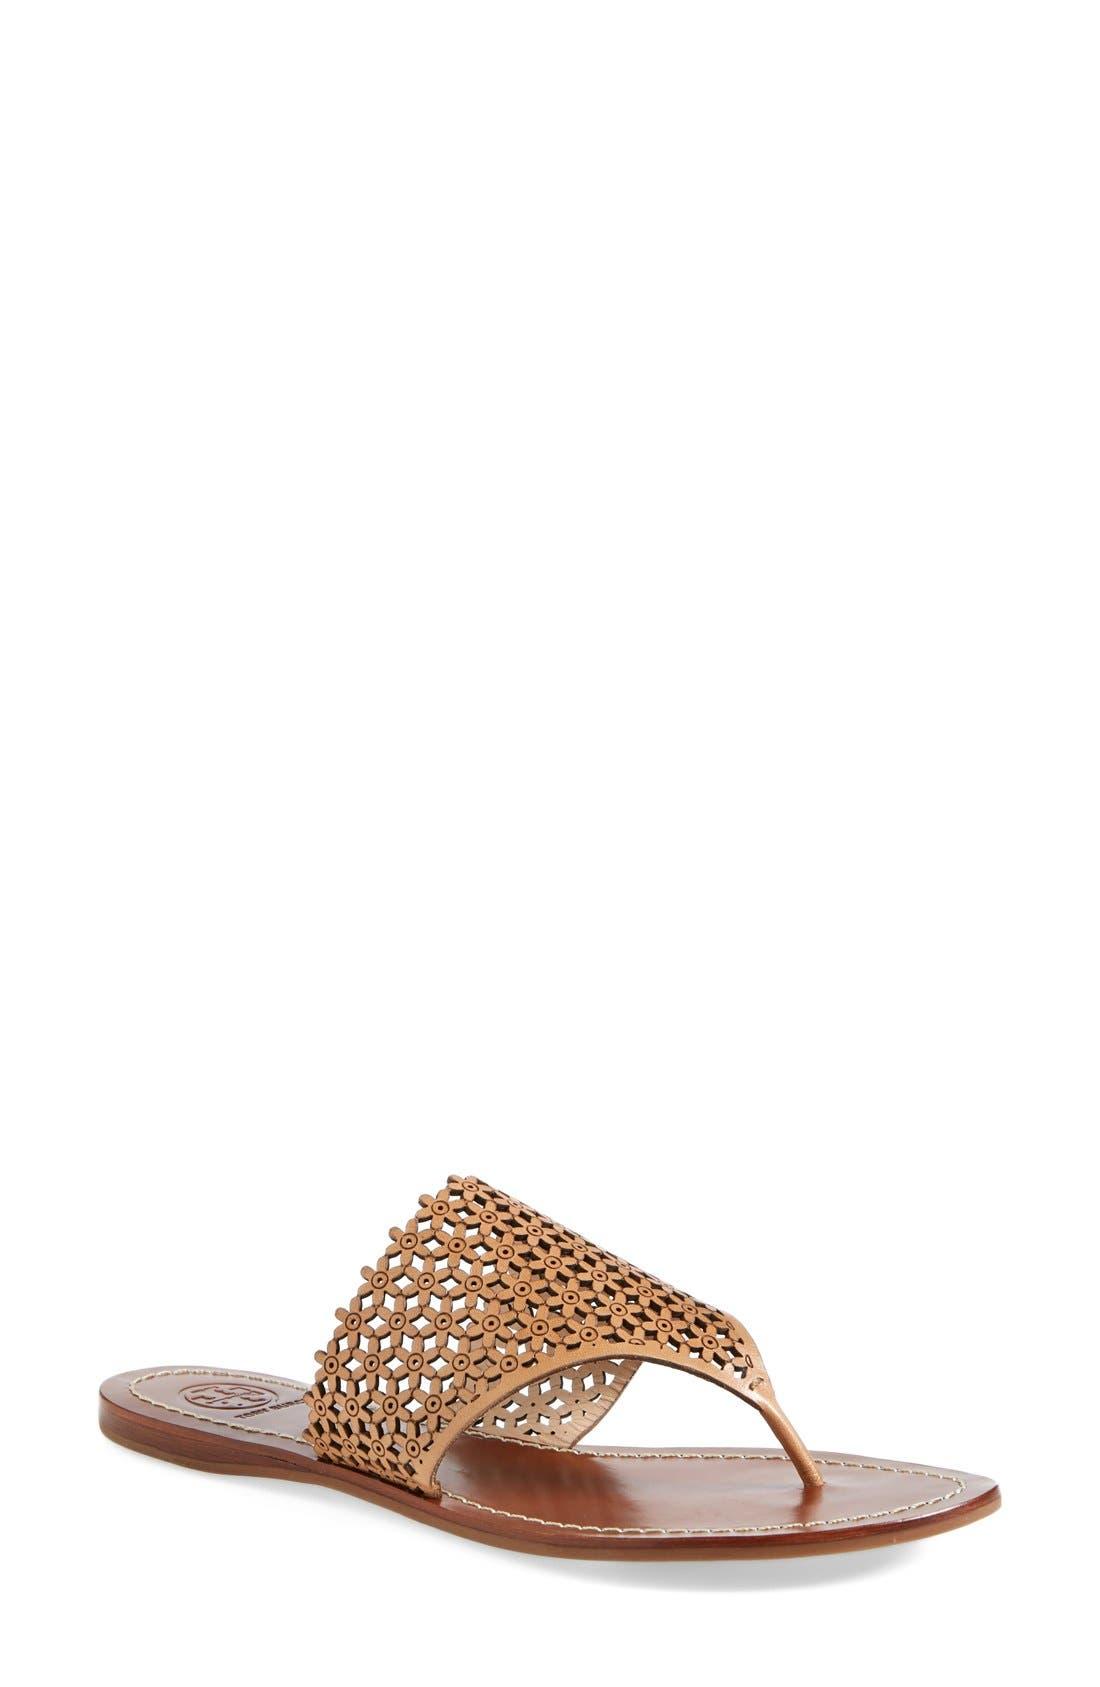 TORY BURCH,                             'Daisy' Perforated Sandal,                             Main thumbnail 1, color,                             671